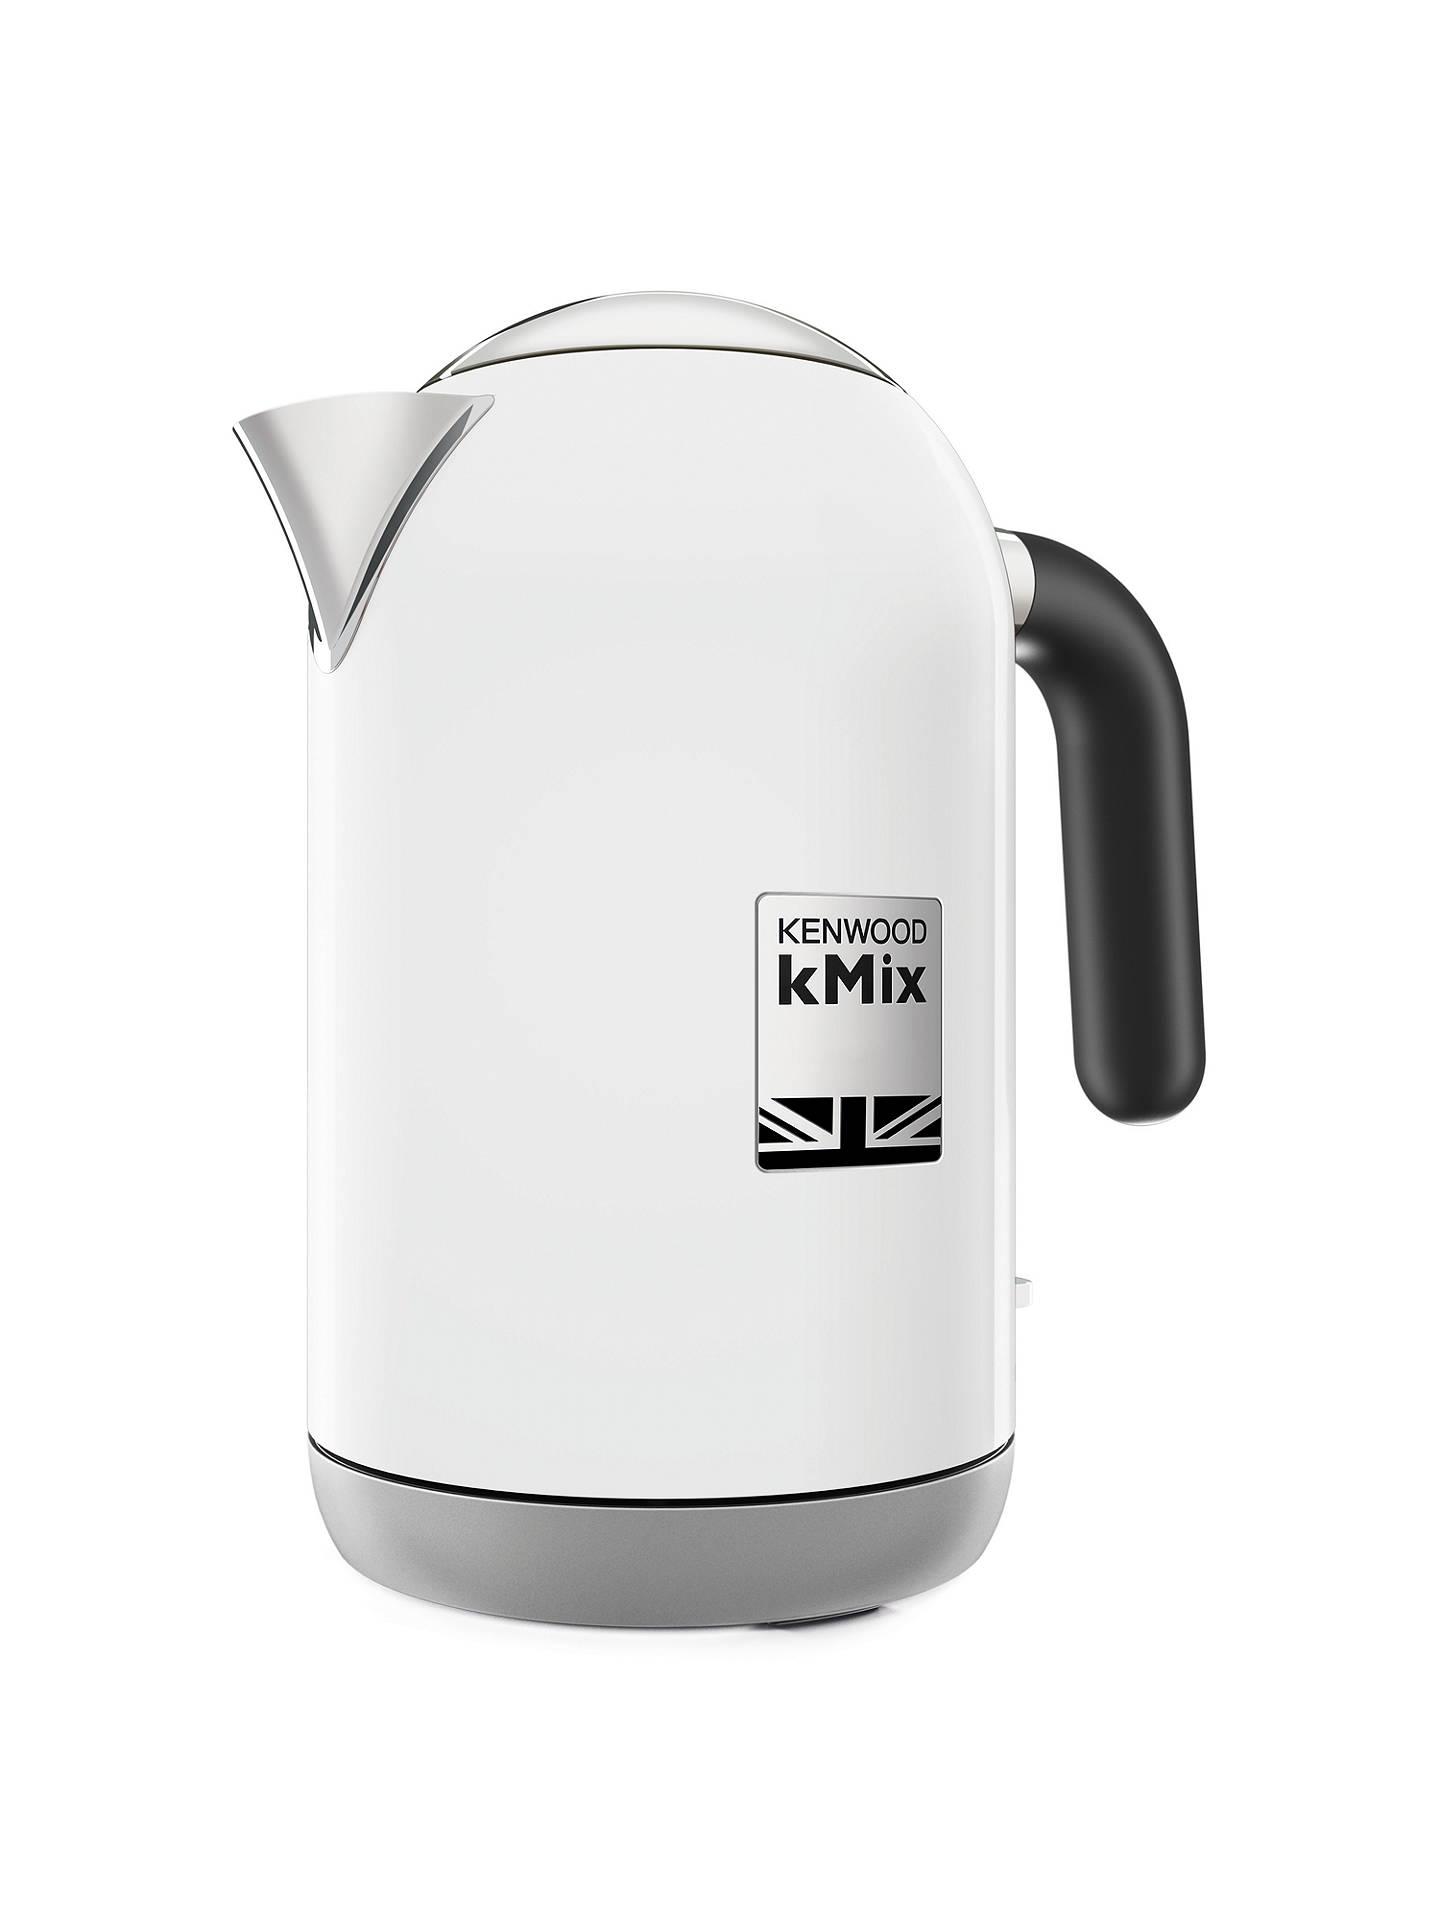 Kenwood Kmix Zjx750 Kettle At John Lewis Amp Partners